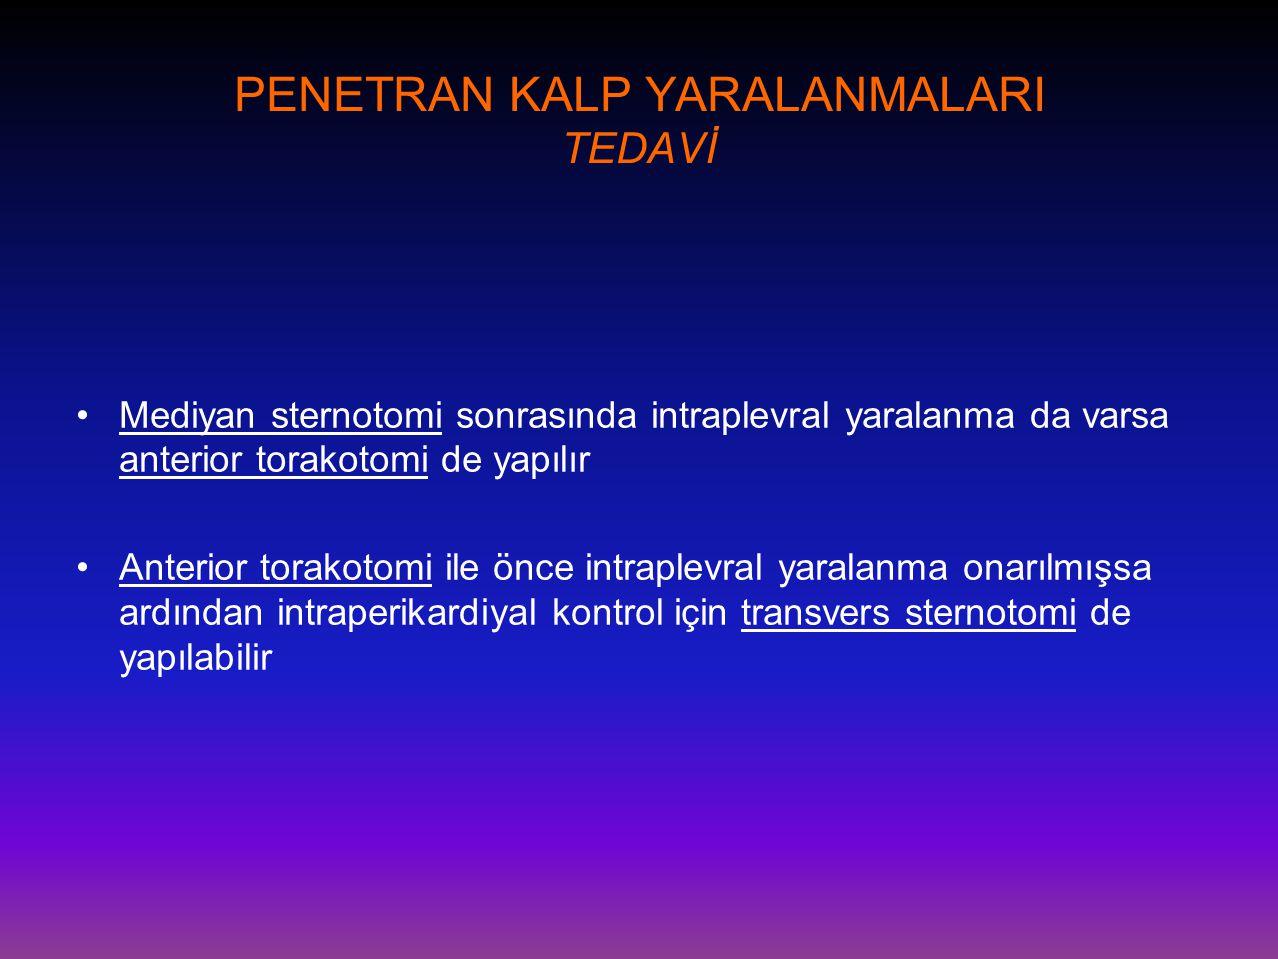 PENETRAN KALP YARALANMALARI TEDAVİ